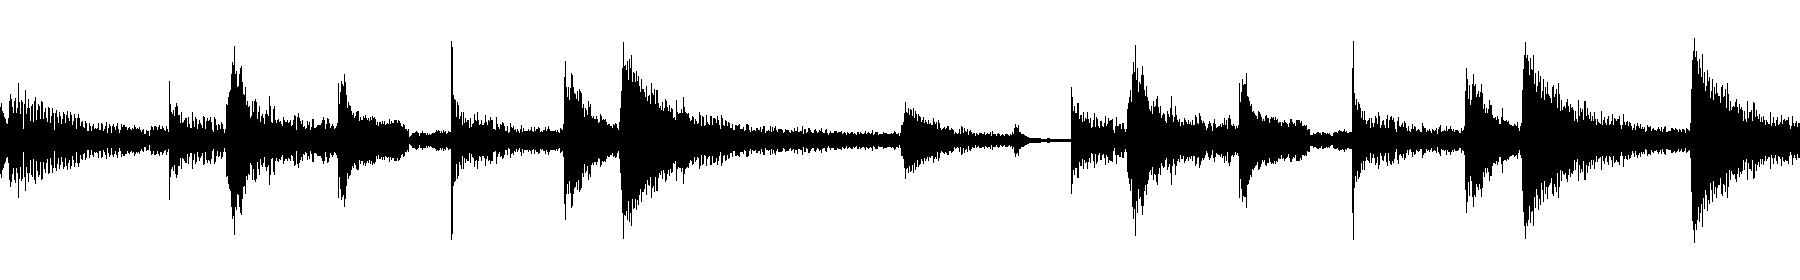 g abs05 076